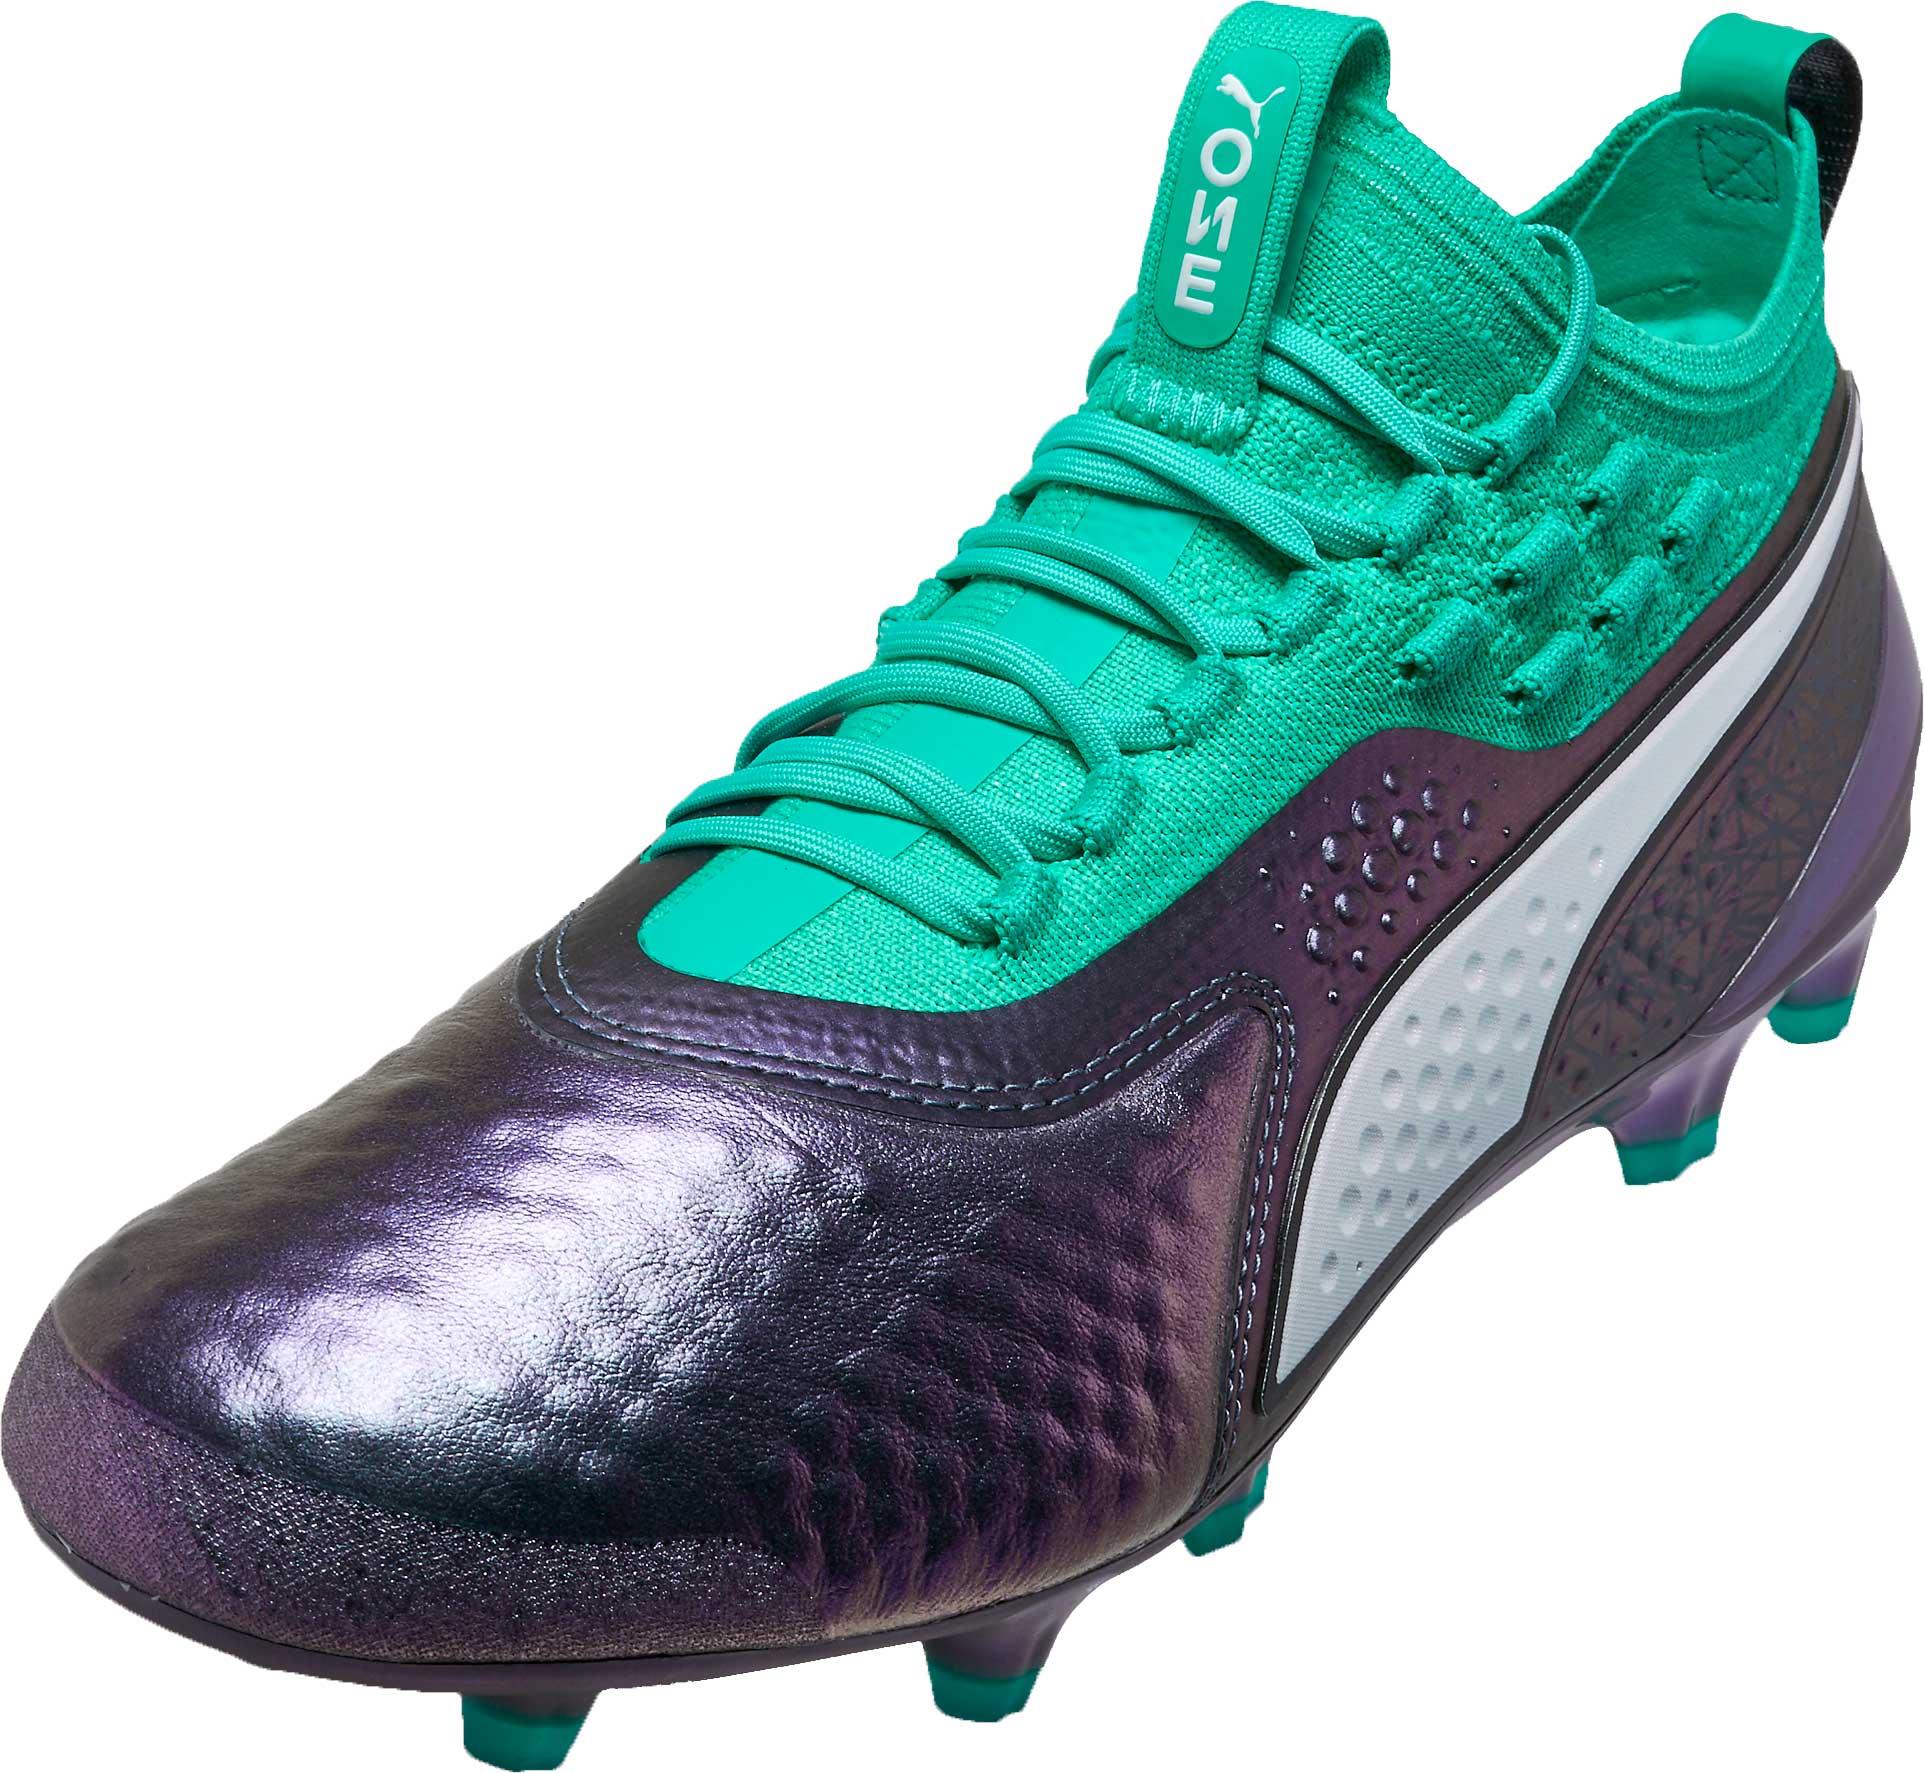 559456144949 PUMA One 1 FG - Leather - Soccer Master